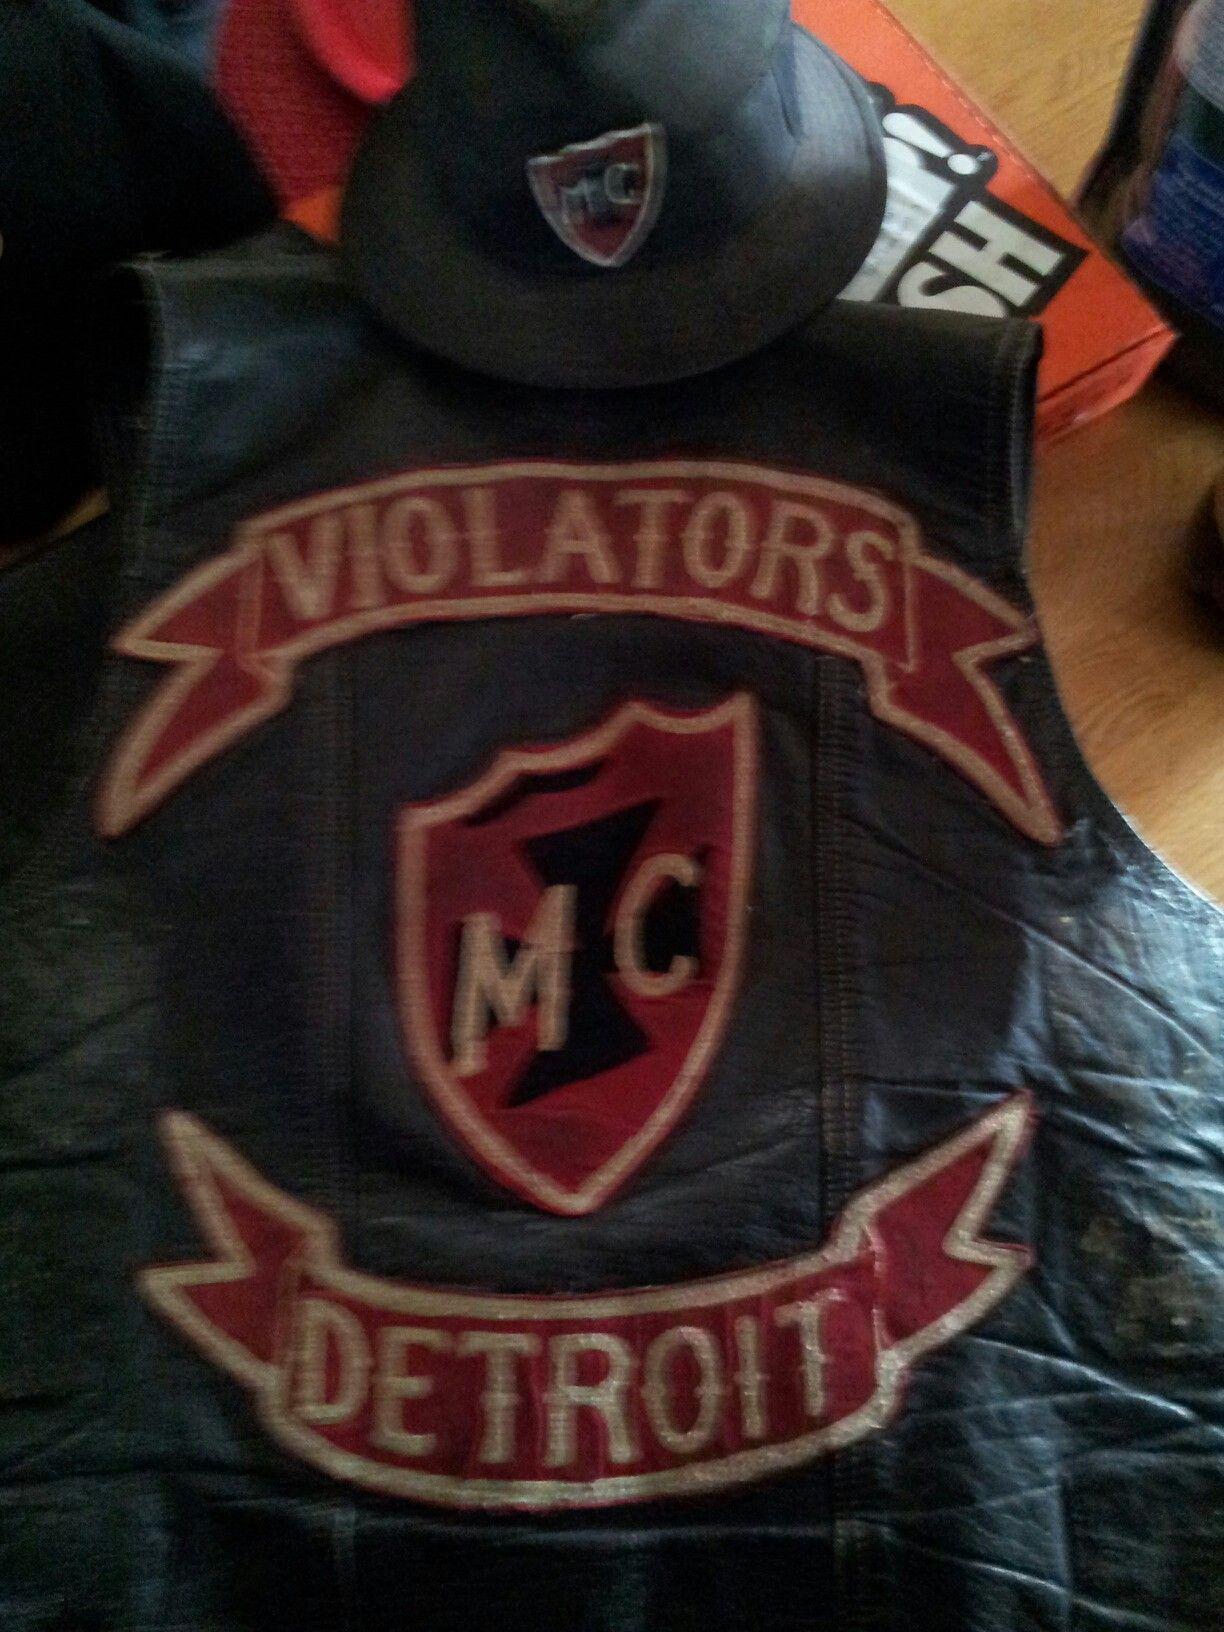 Pin by Charlie DuFresne on Violators MC Michigan | Sports, Vest